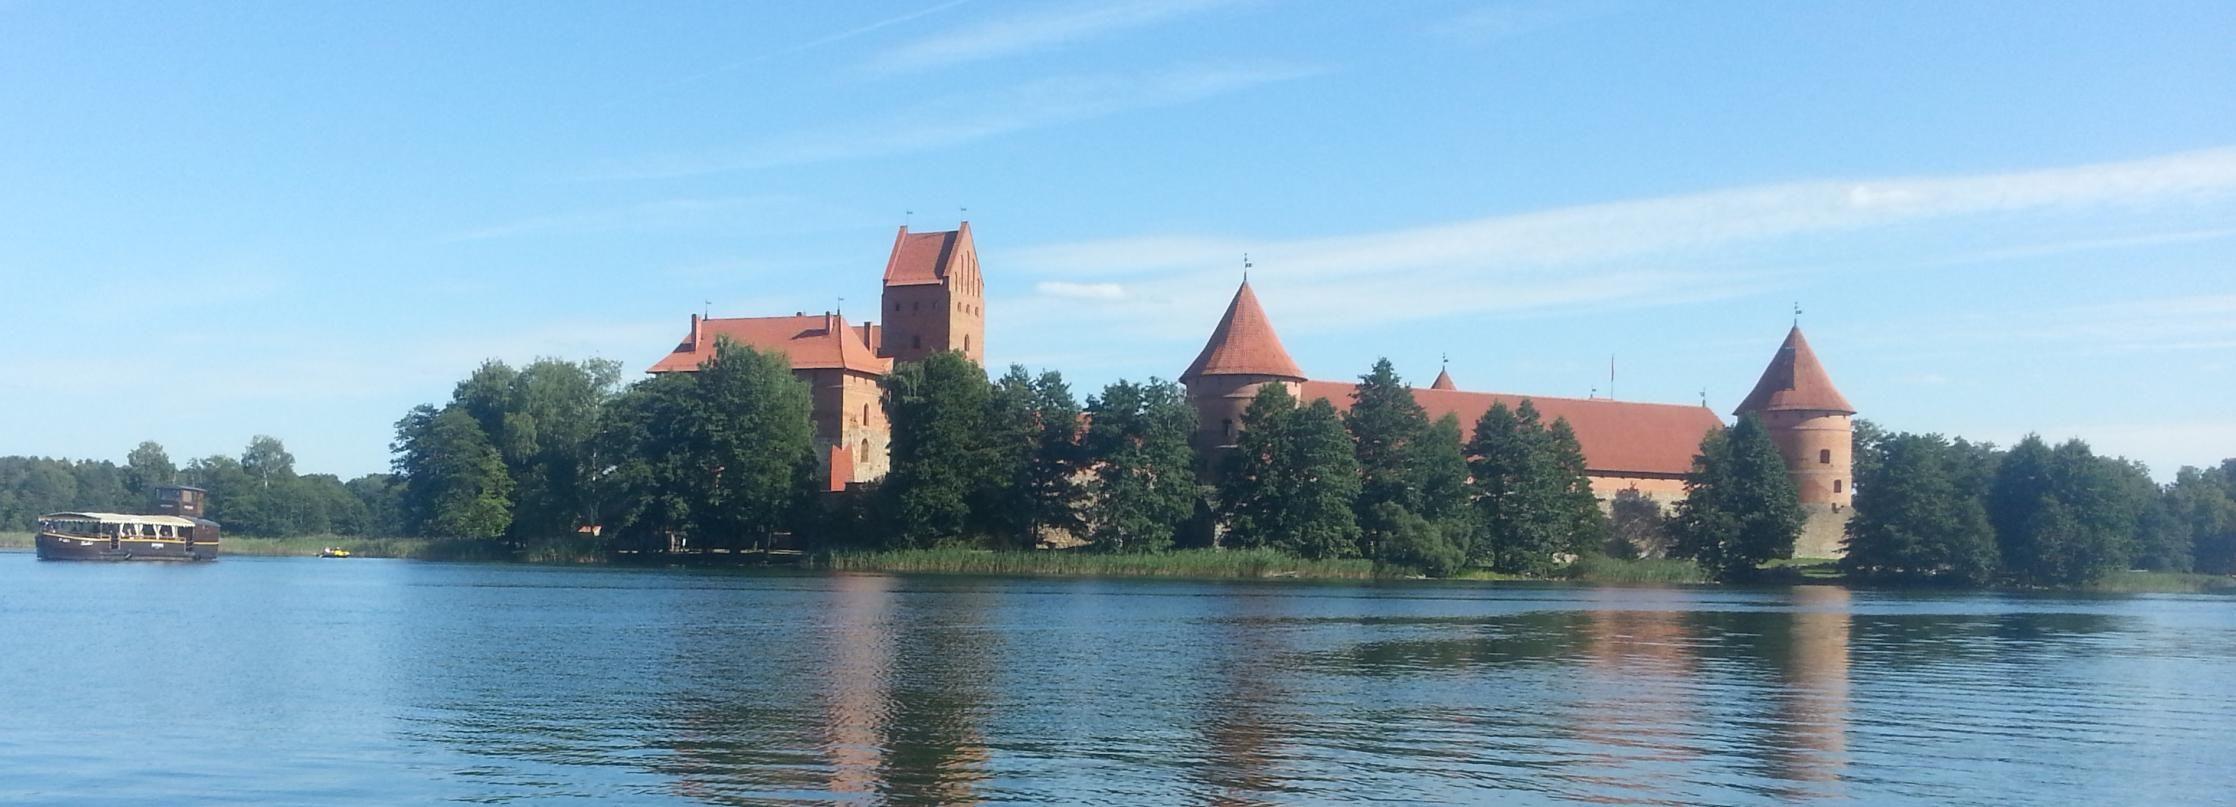 Vilnius: Parque privado de Paneriai, Castelo de Trakai, Passeio de Kernavė